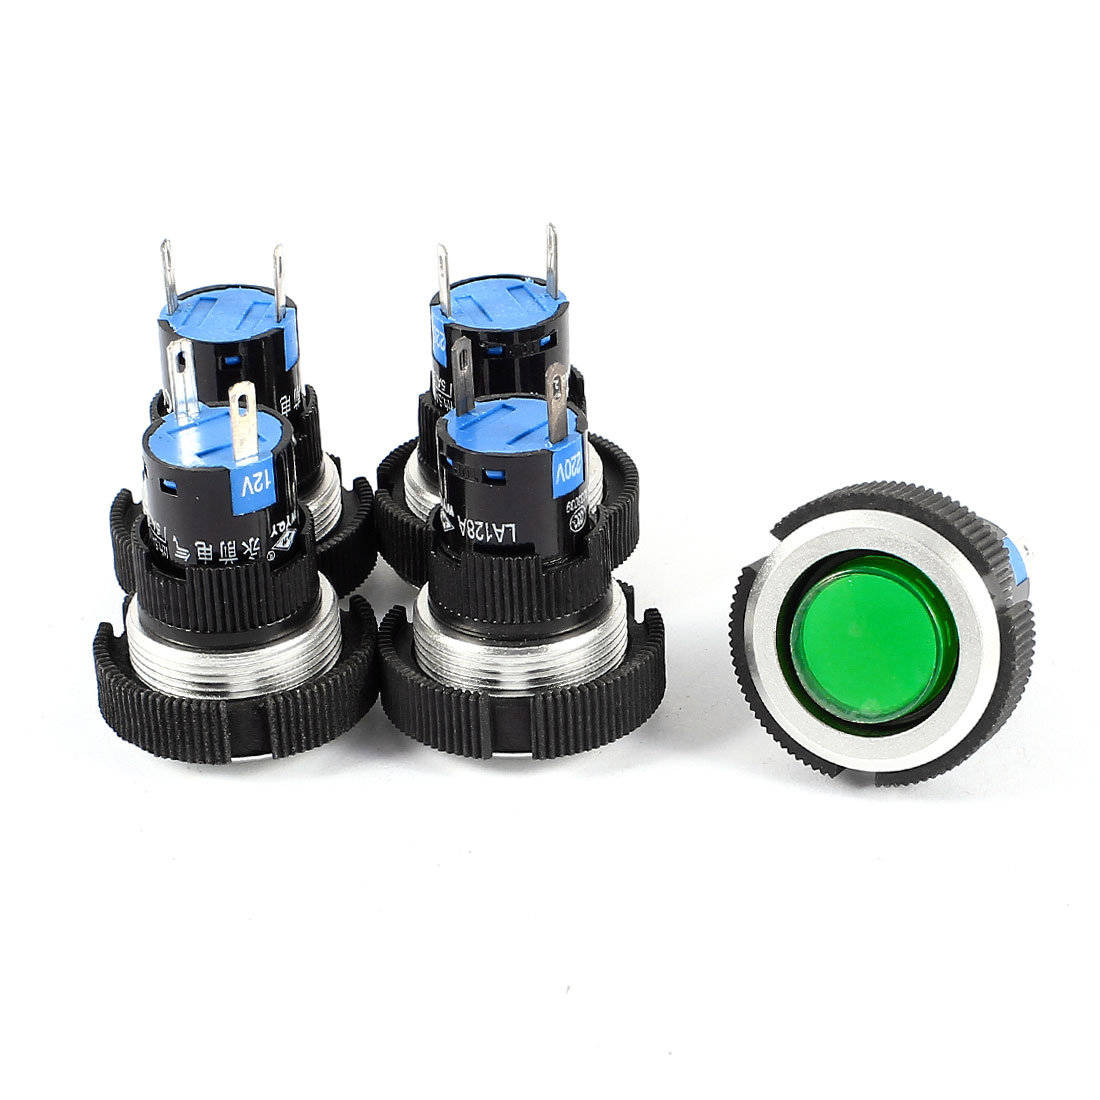 5 Pcs AC 220V 22mm Dia Thread Panel Mounting 2 Terminals Green Lamp Bulb Signal Indicator Light